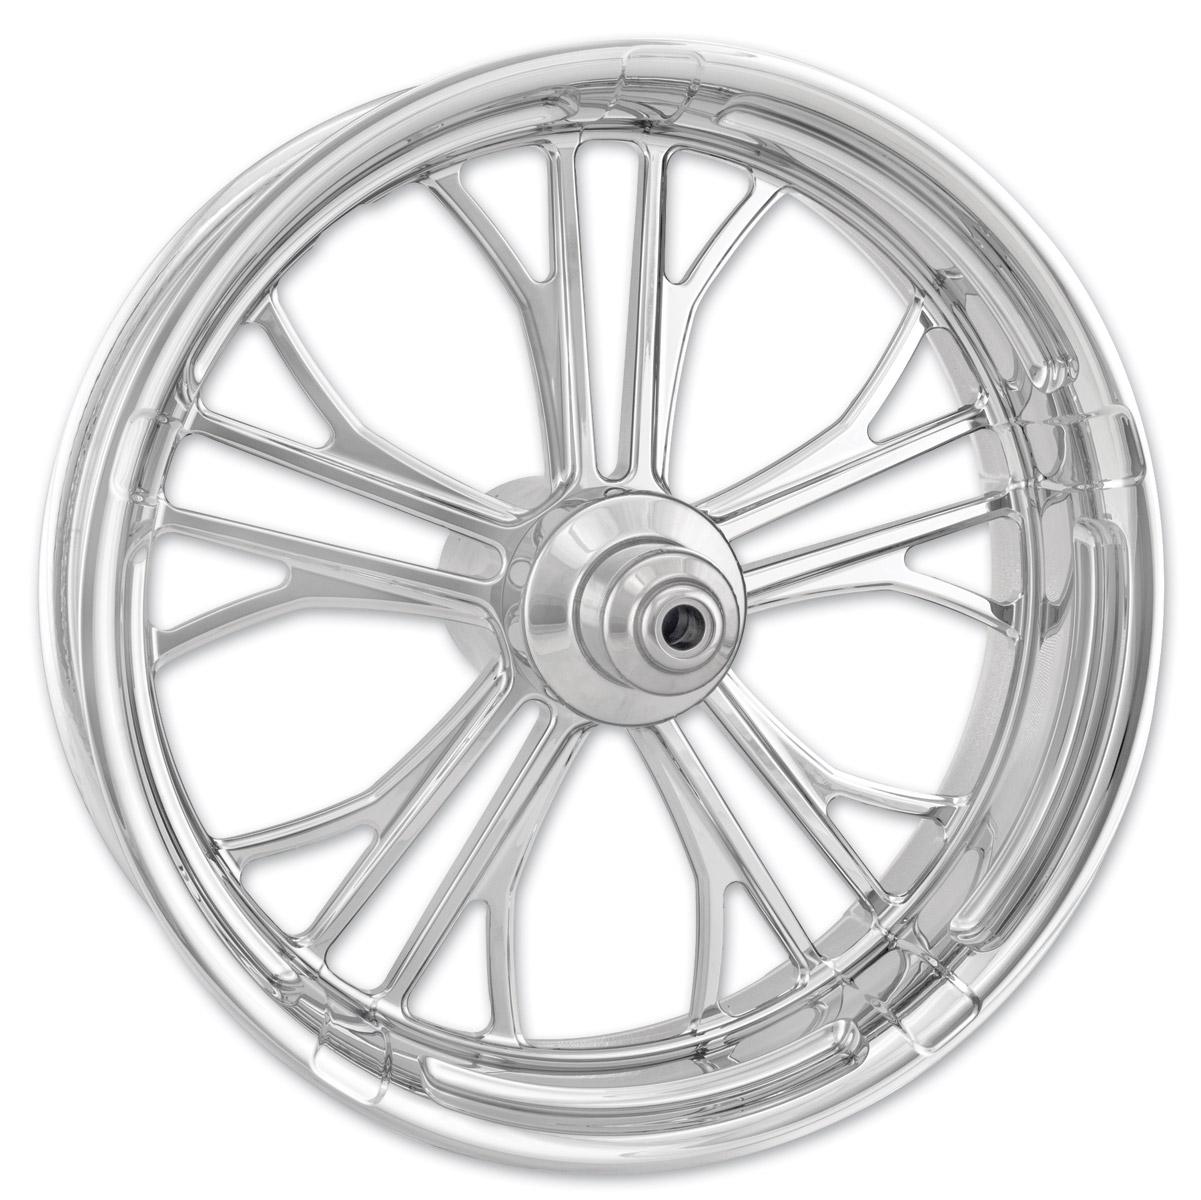 Performance Machine Dixon Chrome Front Wheel, 23″ x 3.5″